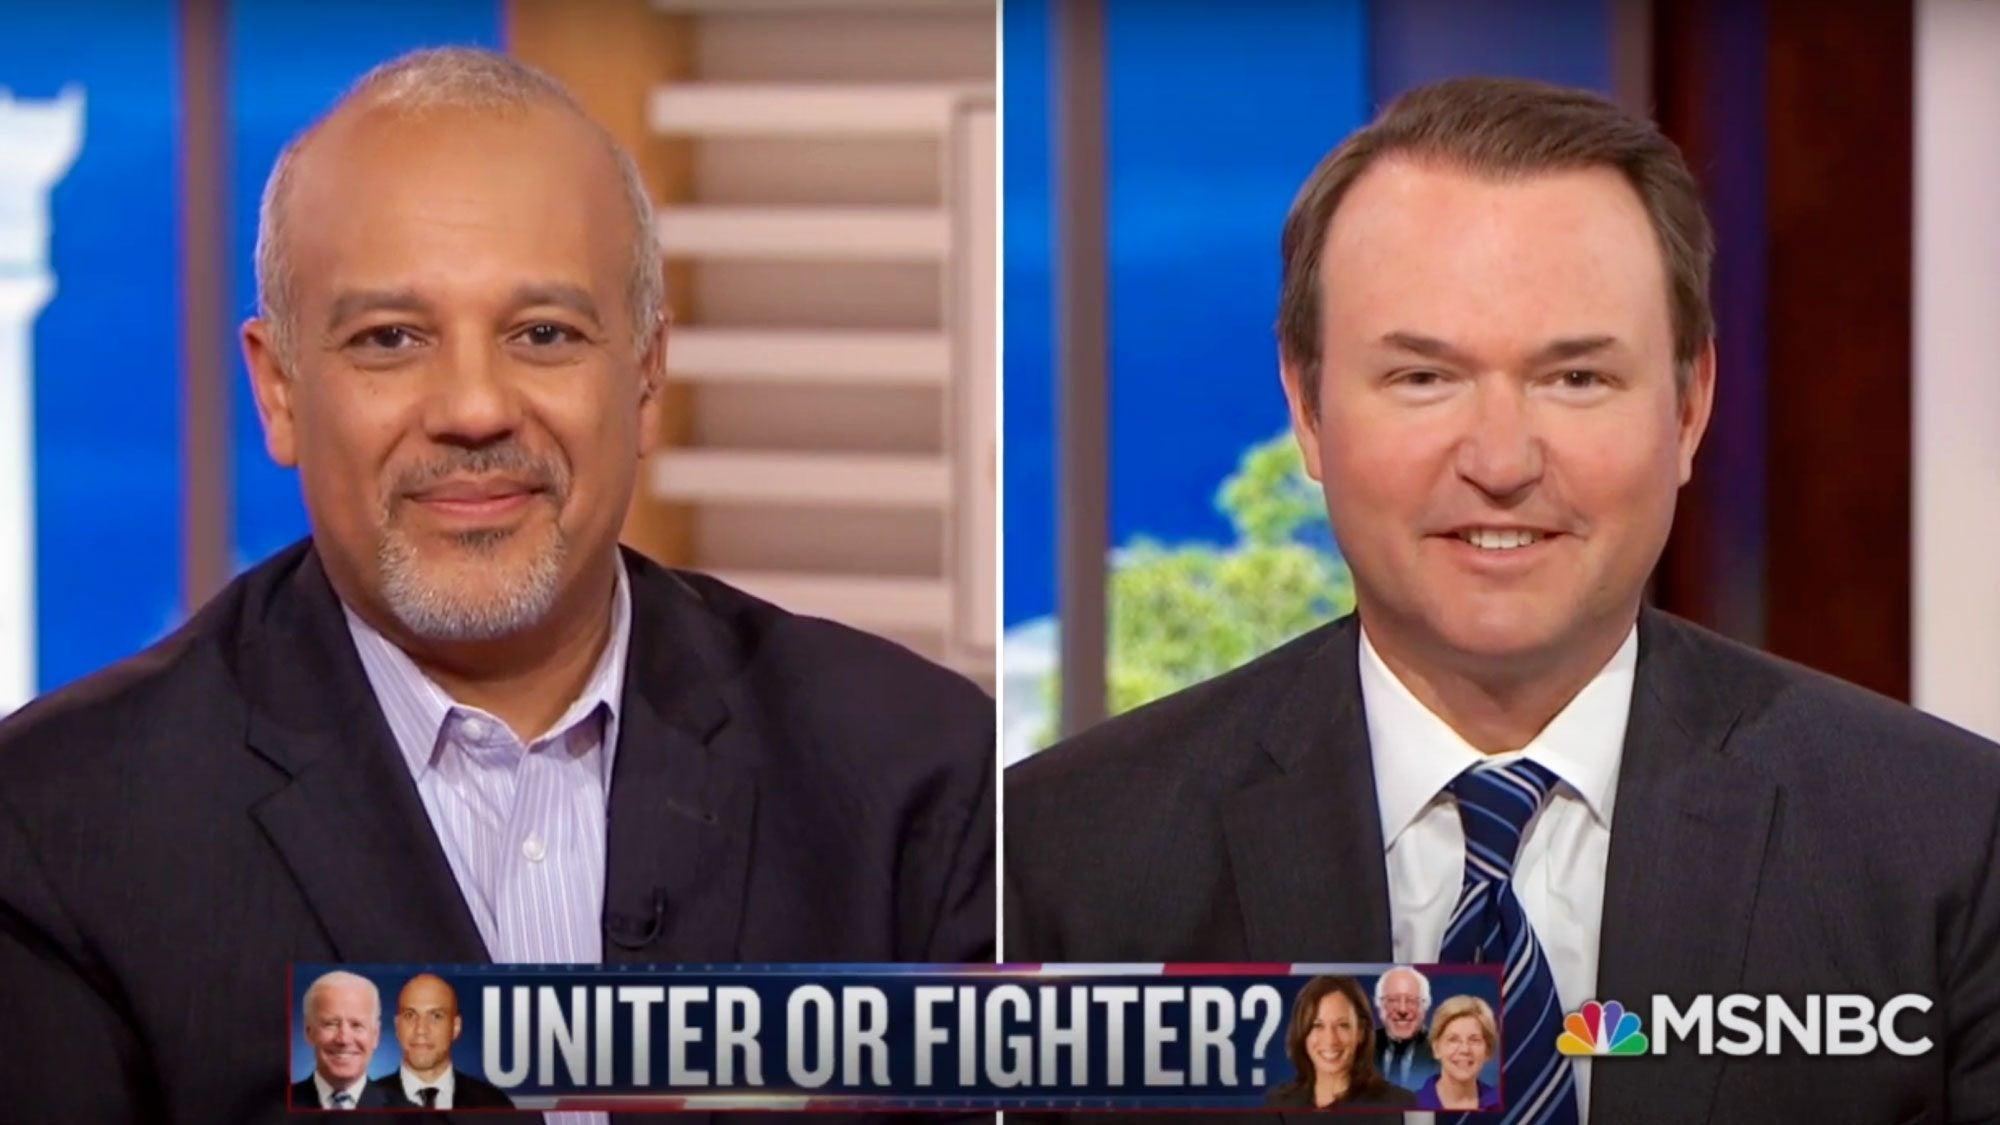 GU Politics Executive Director Mo Elleithee sat down with MSNBC's Chris Matthews and former Fellow Michael Steel